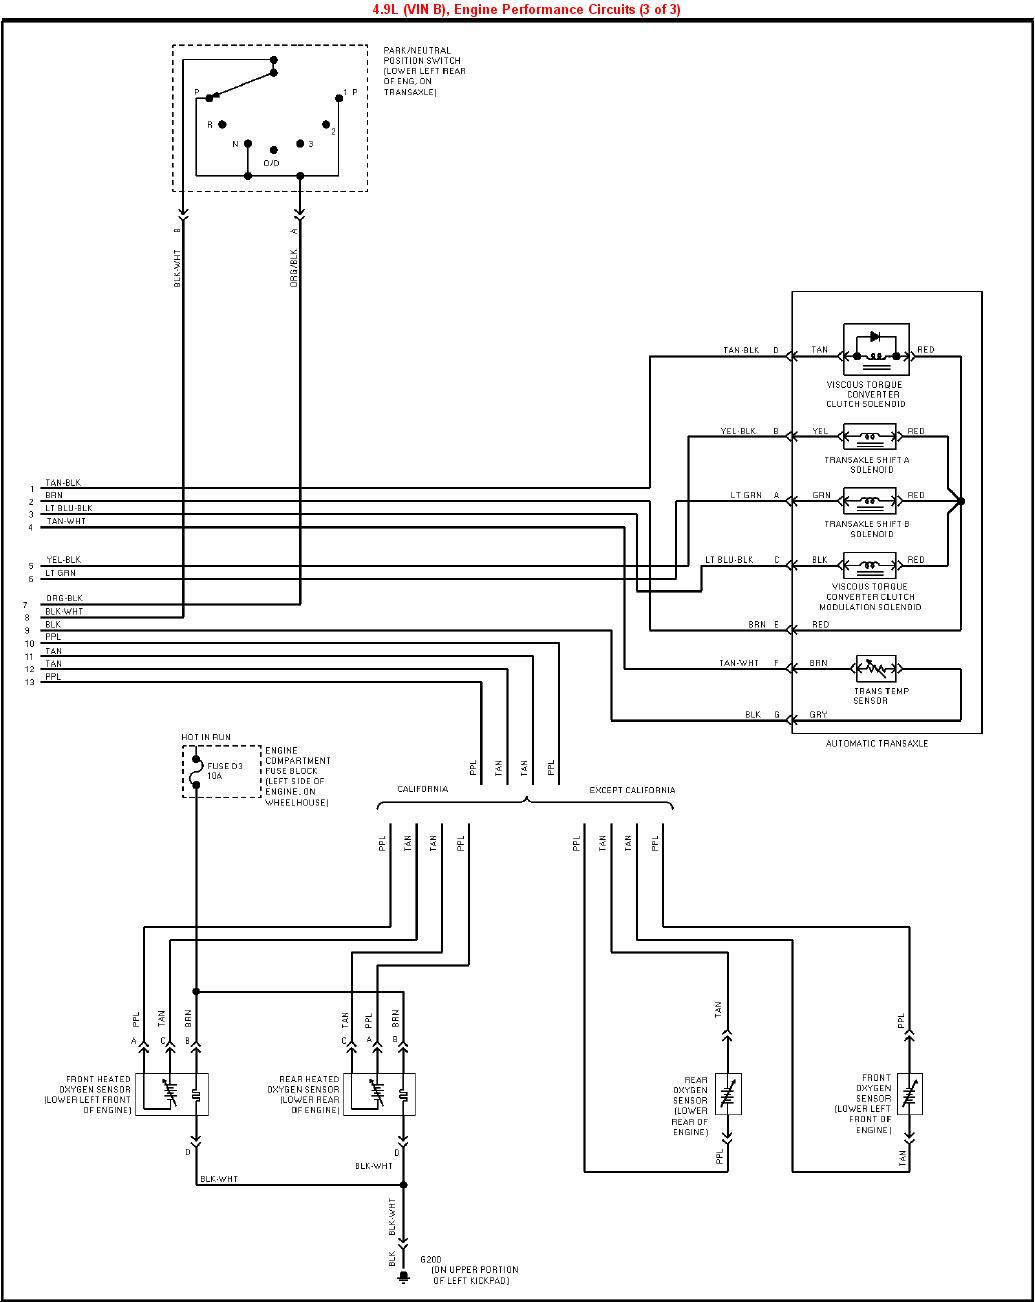 2002 cadillac deville engine diagram fuse box for 2000 cadillac 1999 Cadillac DeVille Wiring-Diagram medium resolution of 1990 cadillac brougham fuse box diagram trusted wiring diagrams u2022 1999 cadillac deville